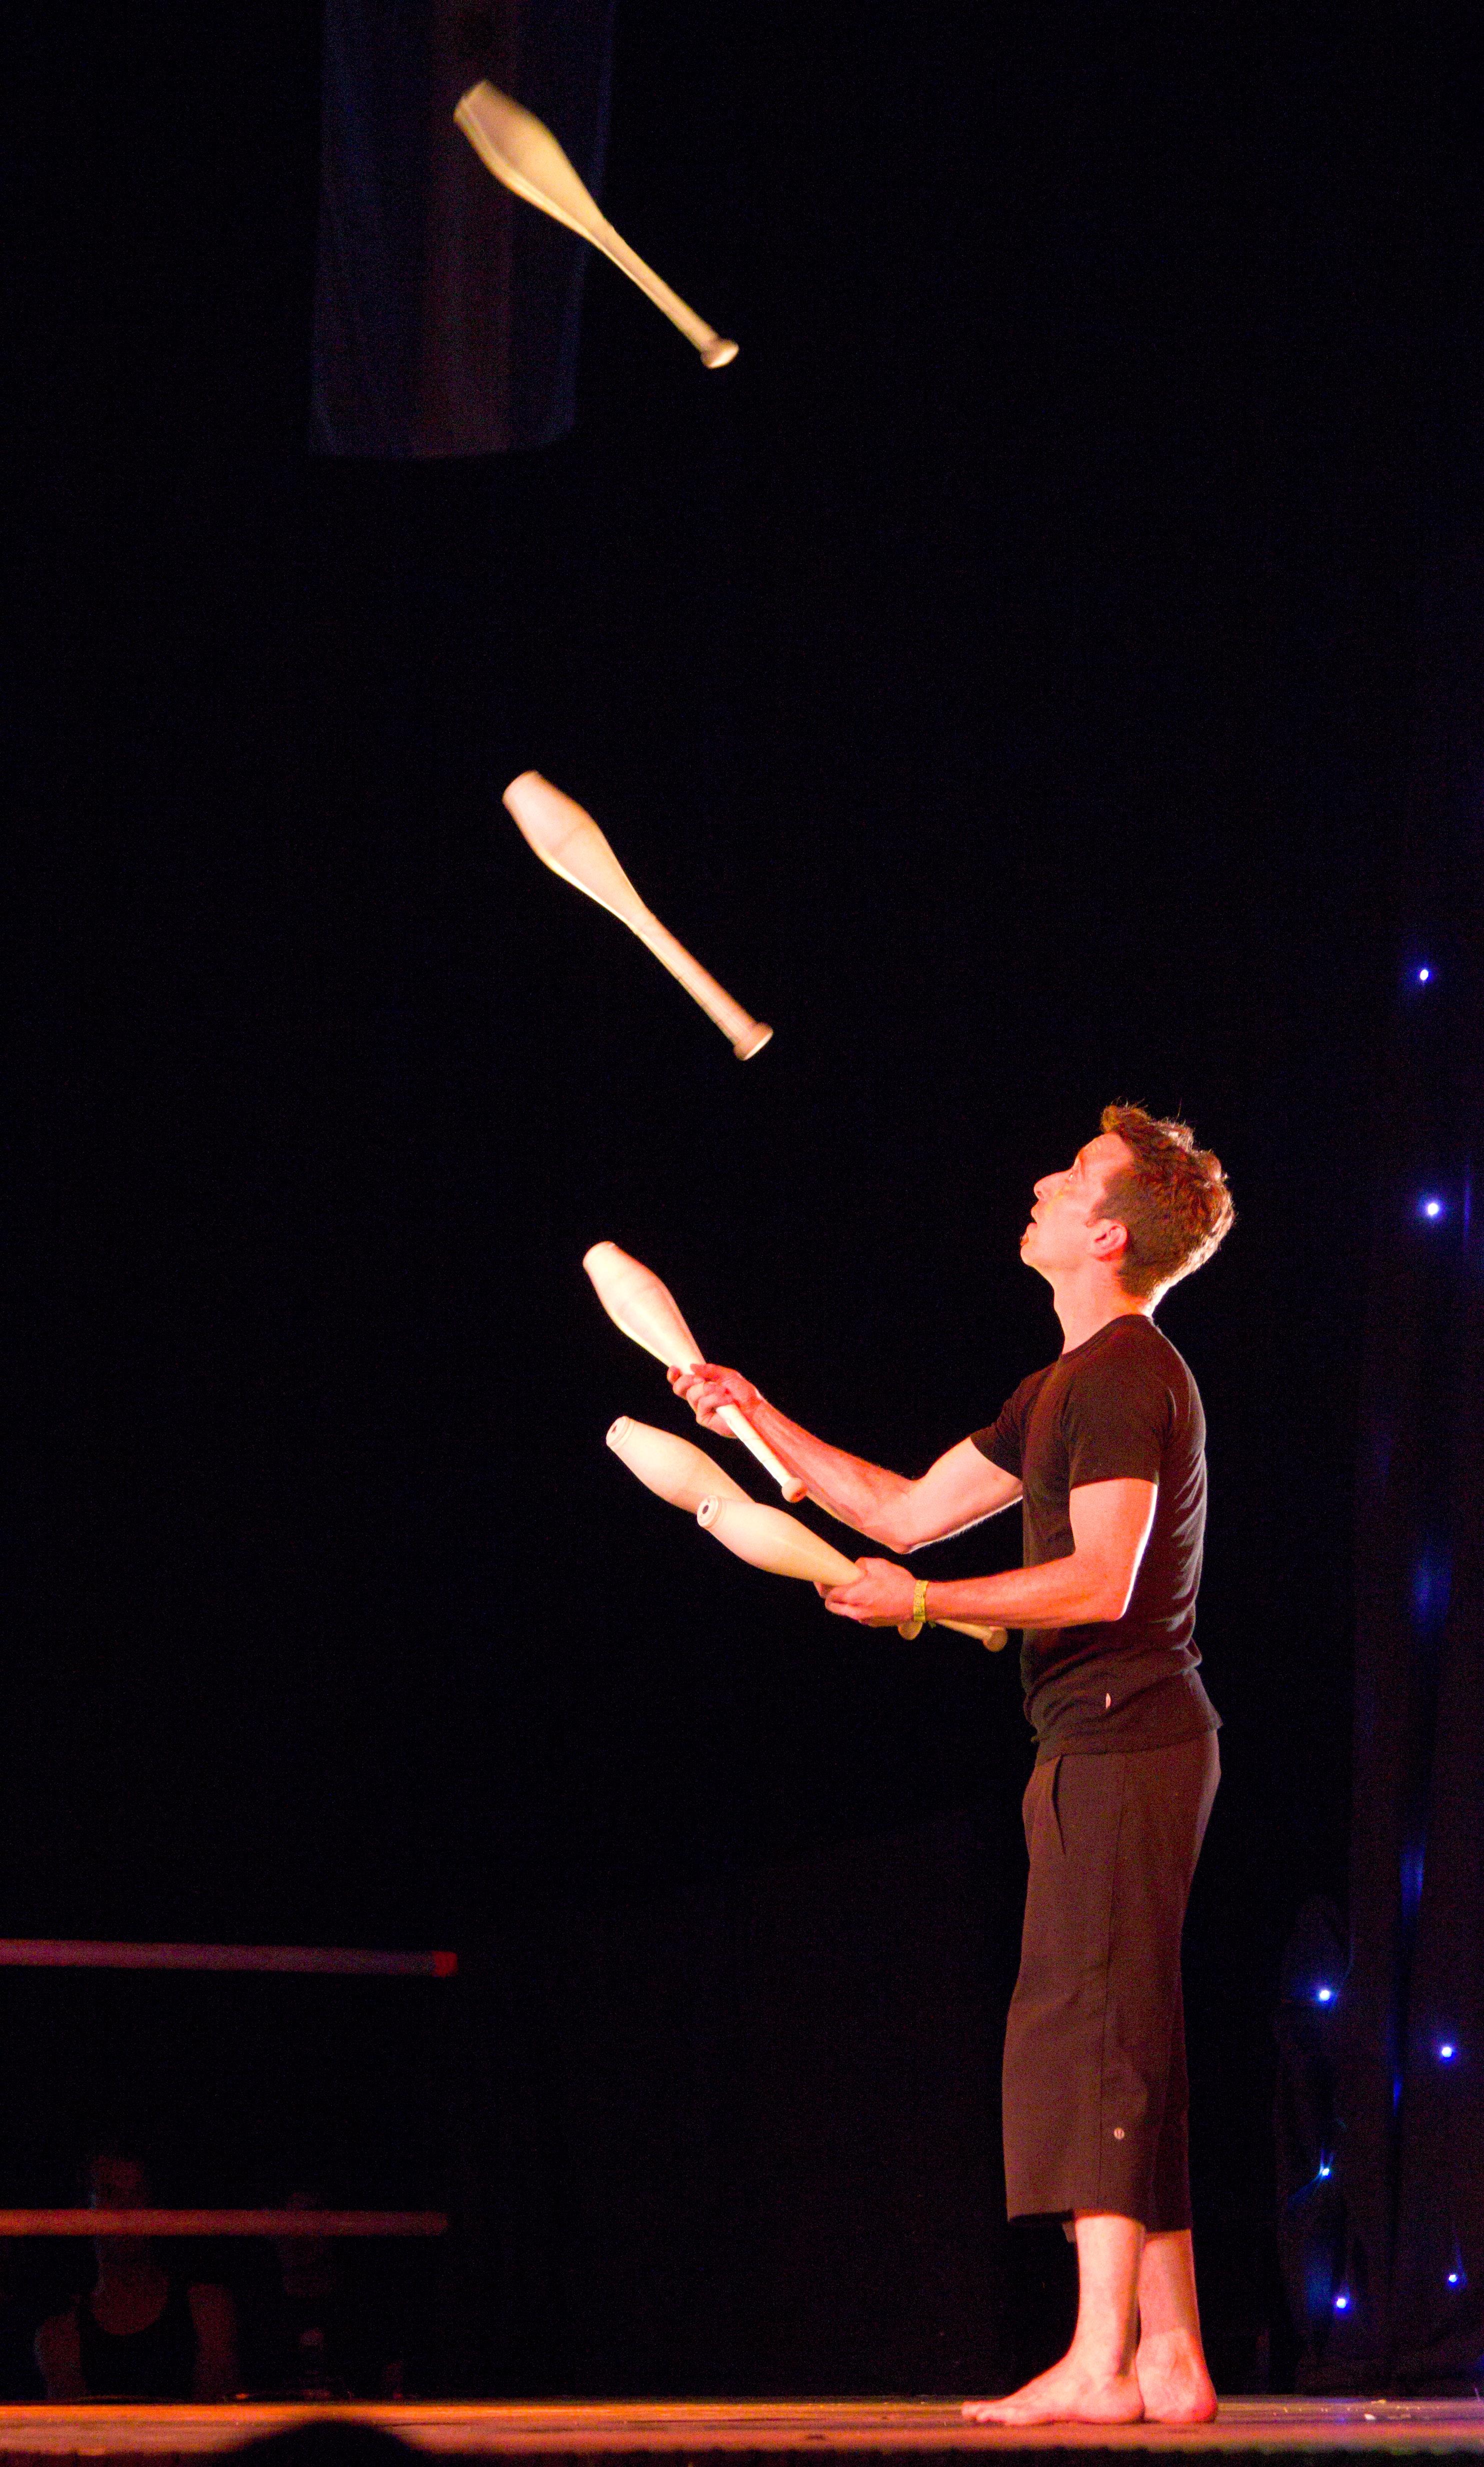 EJC 2014 Millstreet: Open Stage on Sunday 20th July.